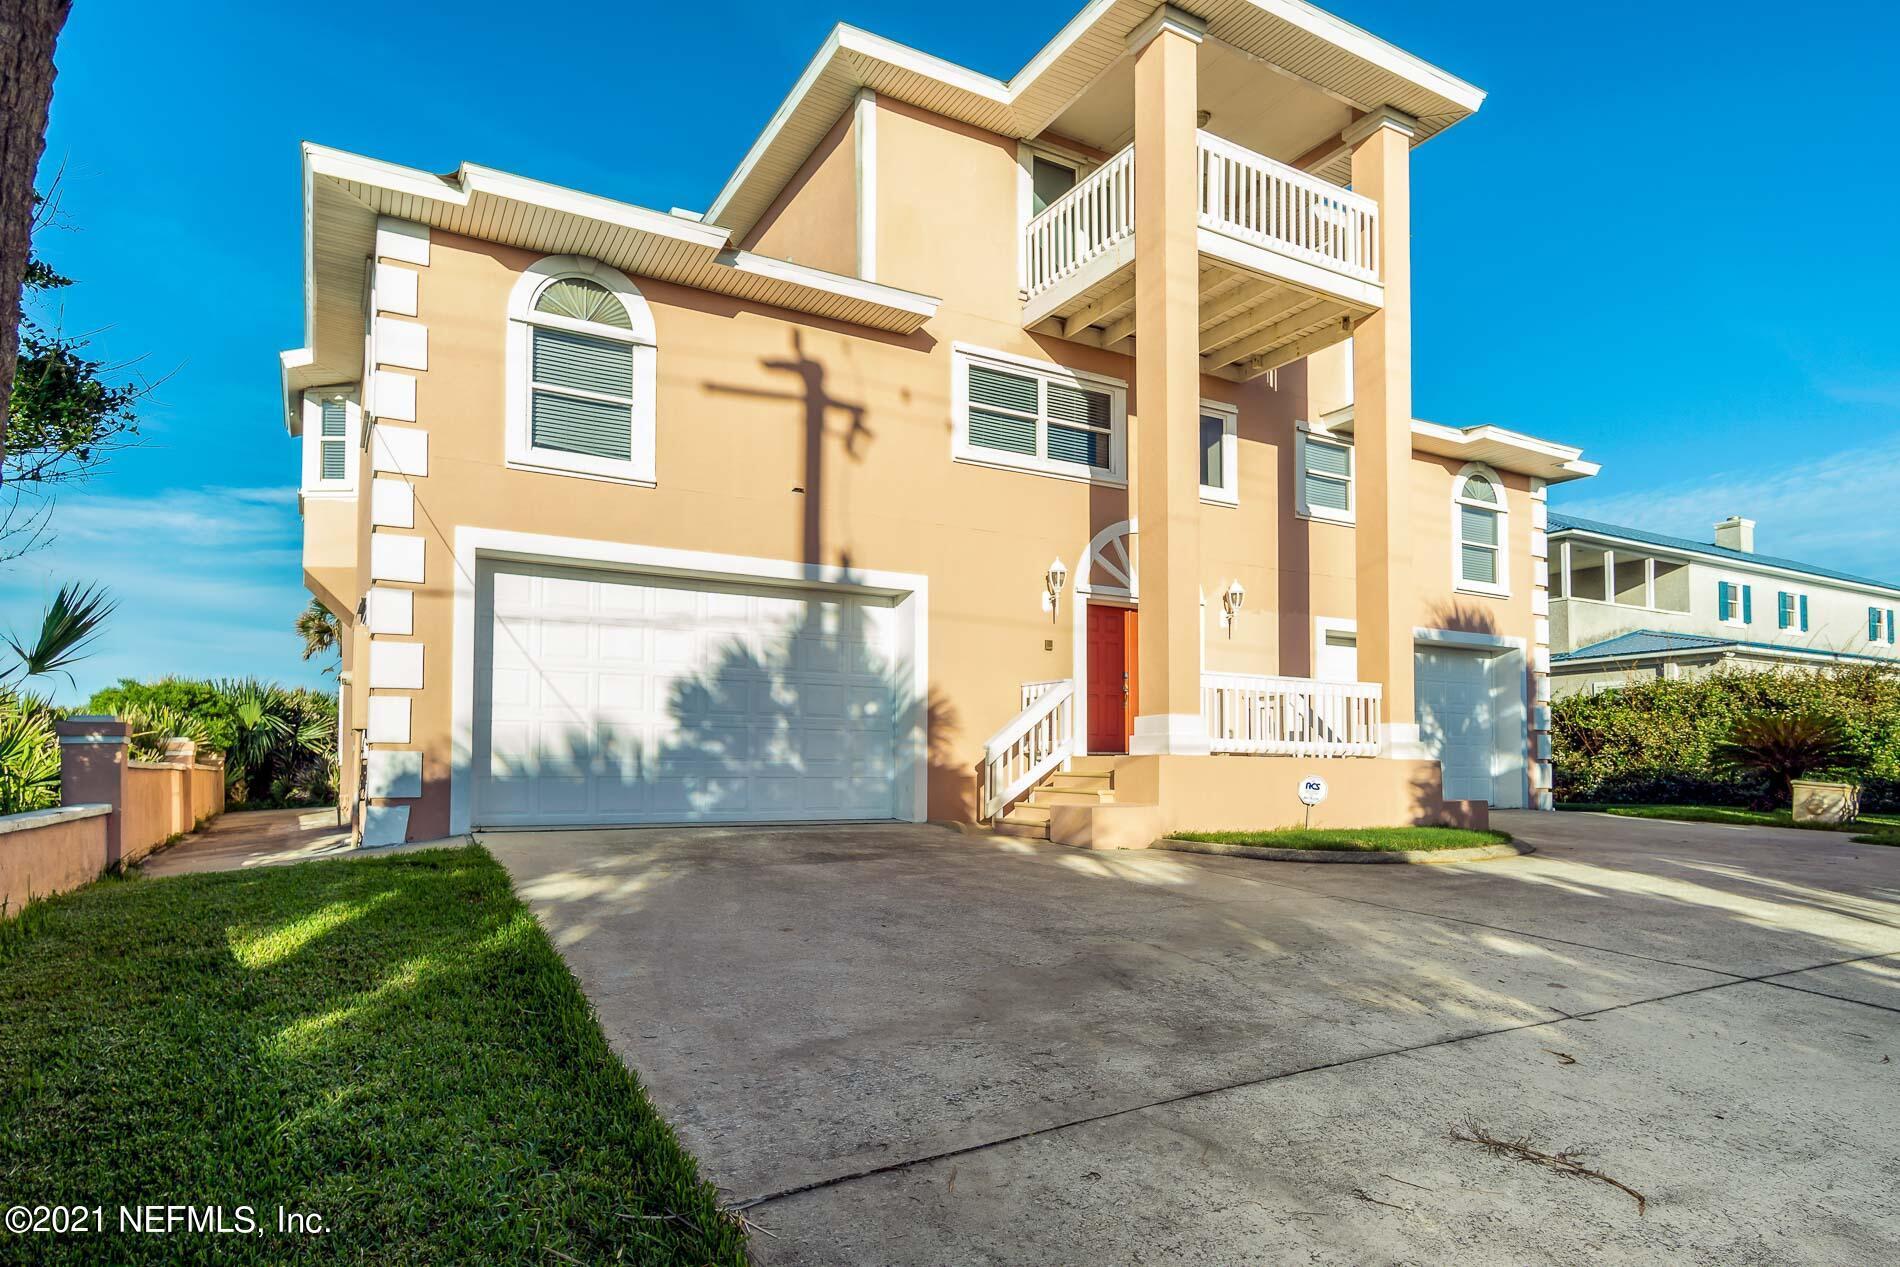 2477 PONTE VEDRA, PONTE VEDRA BEACH, FLORIDA 32082, 6 Bedrooms Bedrooms, ,3 BathroomsBathrooms,Residential,For sale,PONTE VEDRA,1120410